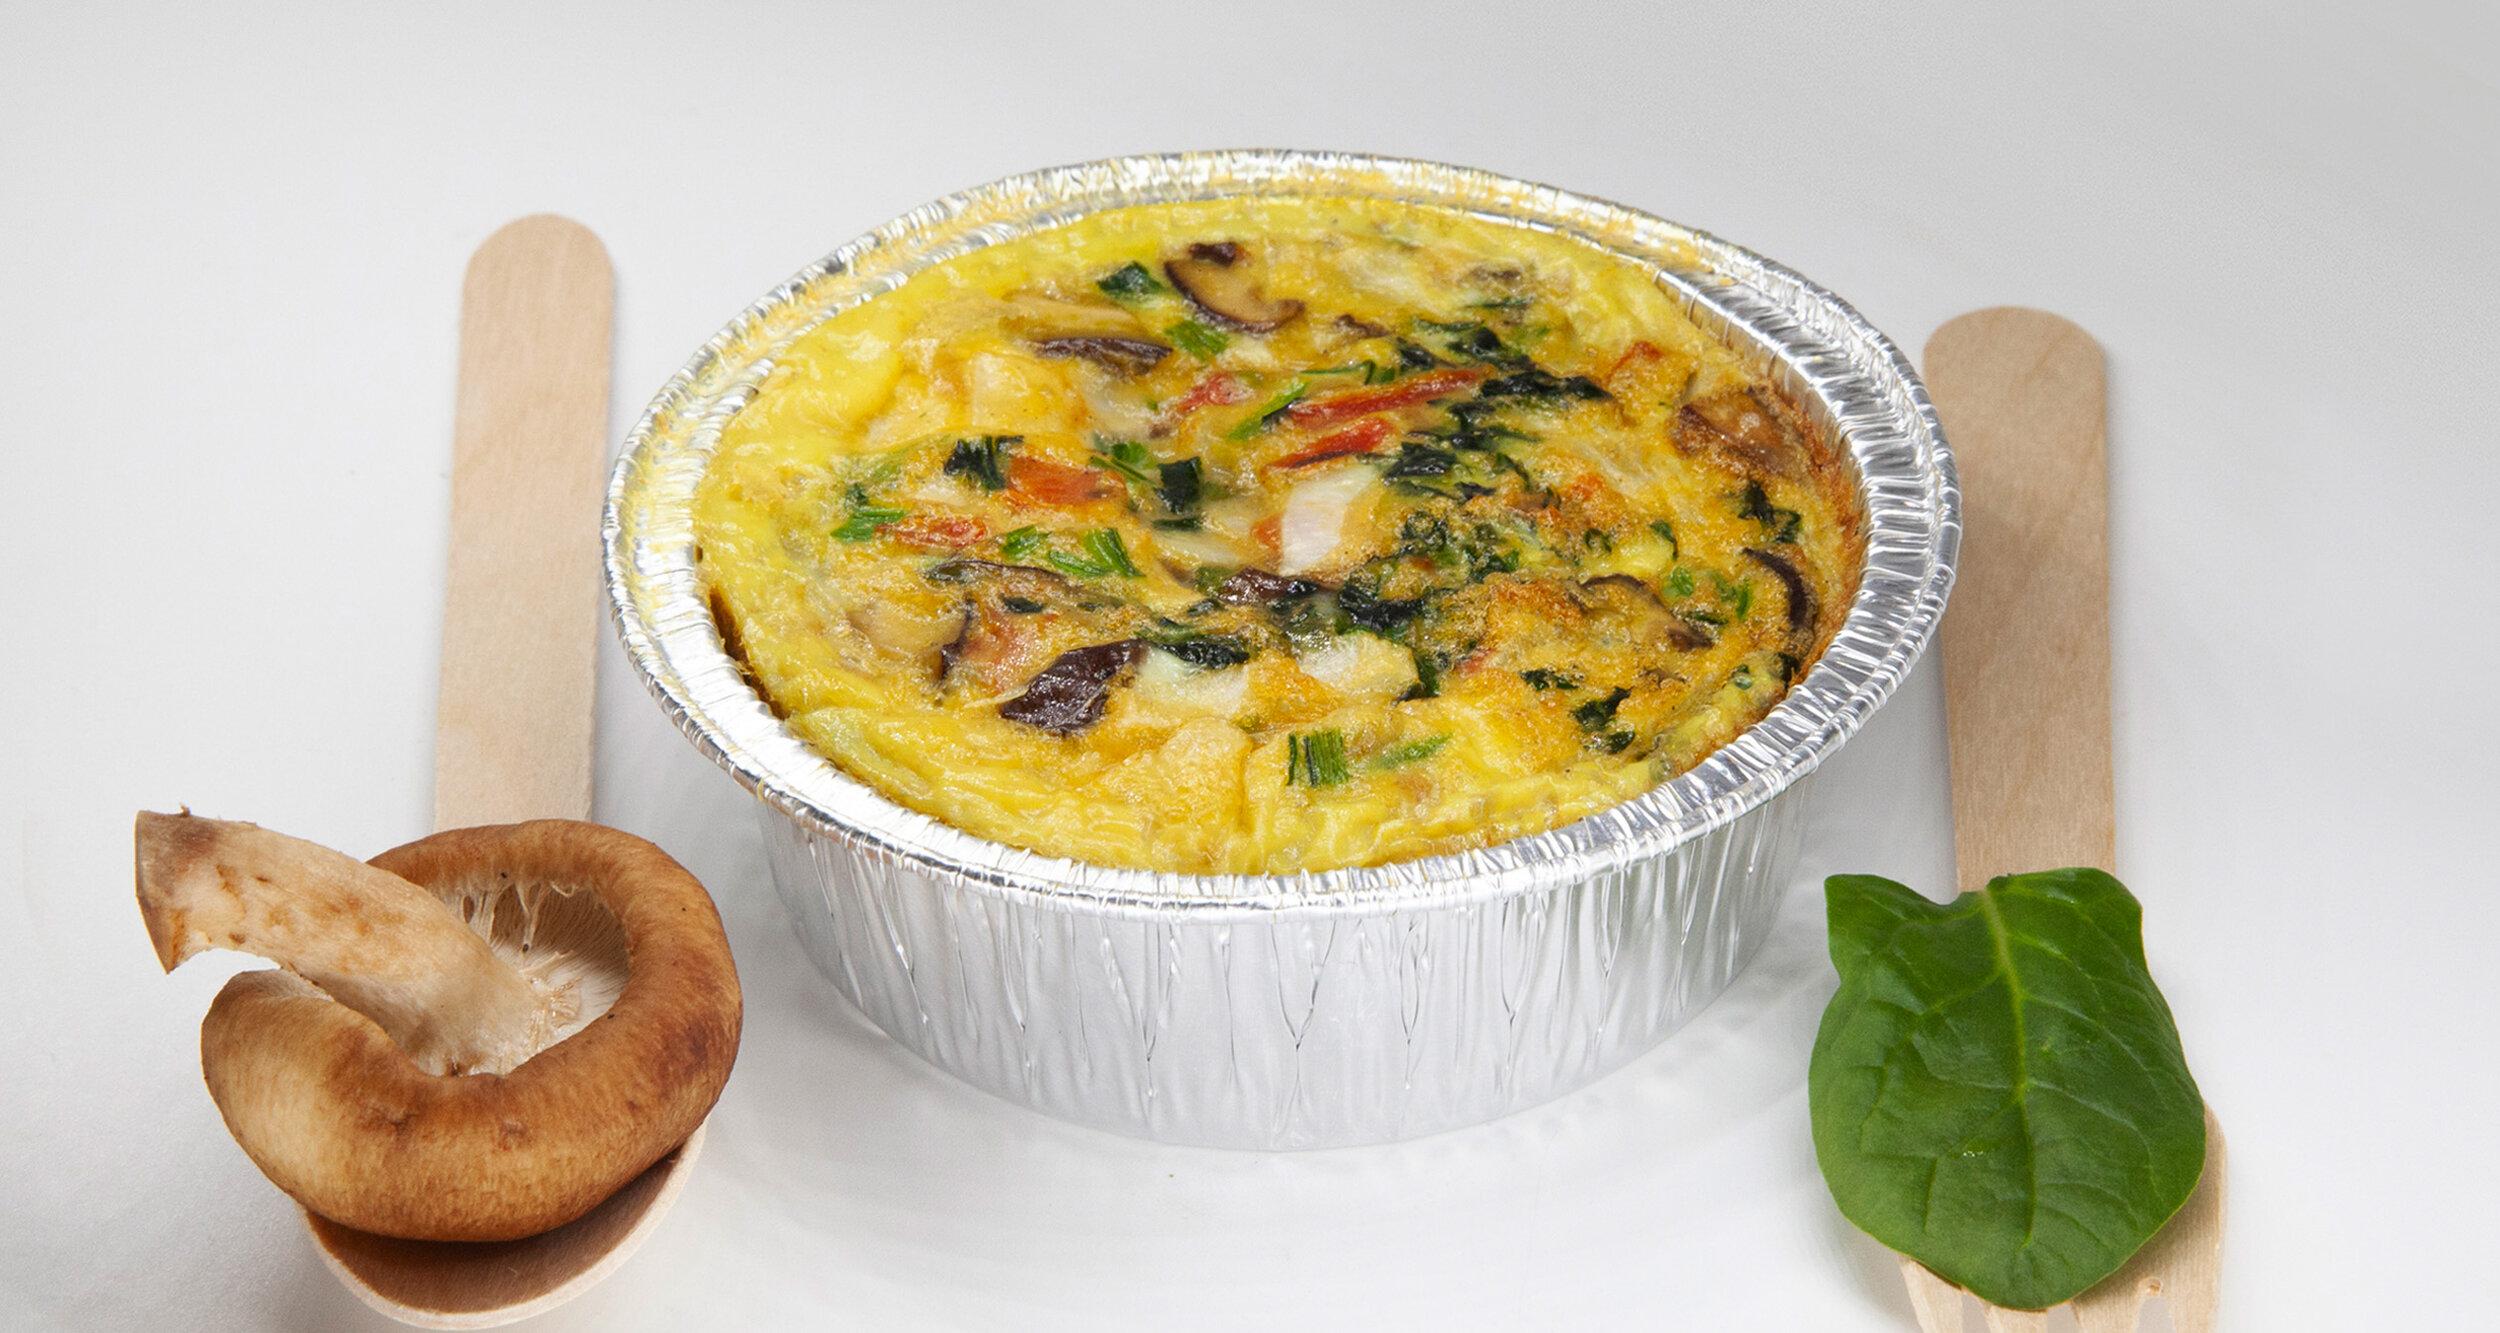 MUSHROOM EGG MUFFIN - 184.3 KCAL PER SERVINGEgg, spinach, tomato, onion, button mushroom, salt, pepper$23